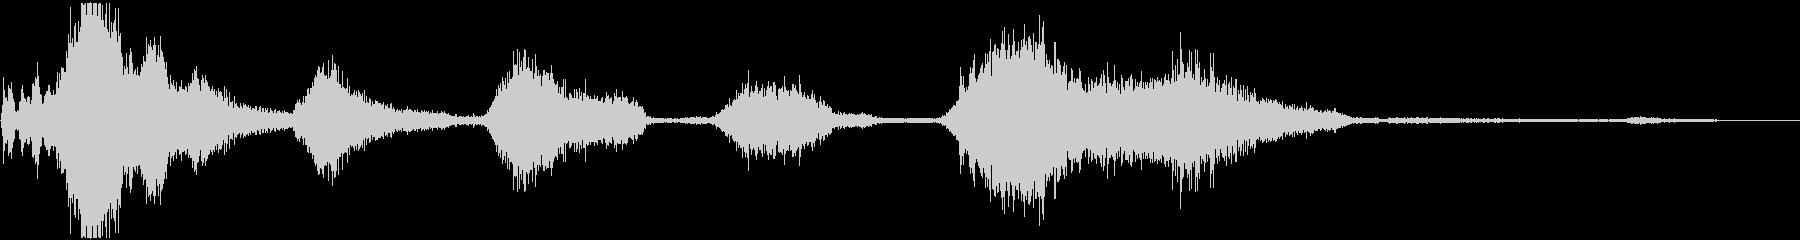 EXT:開始、REVSを使用したア...の未再生の波形